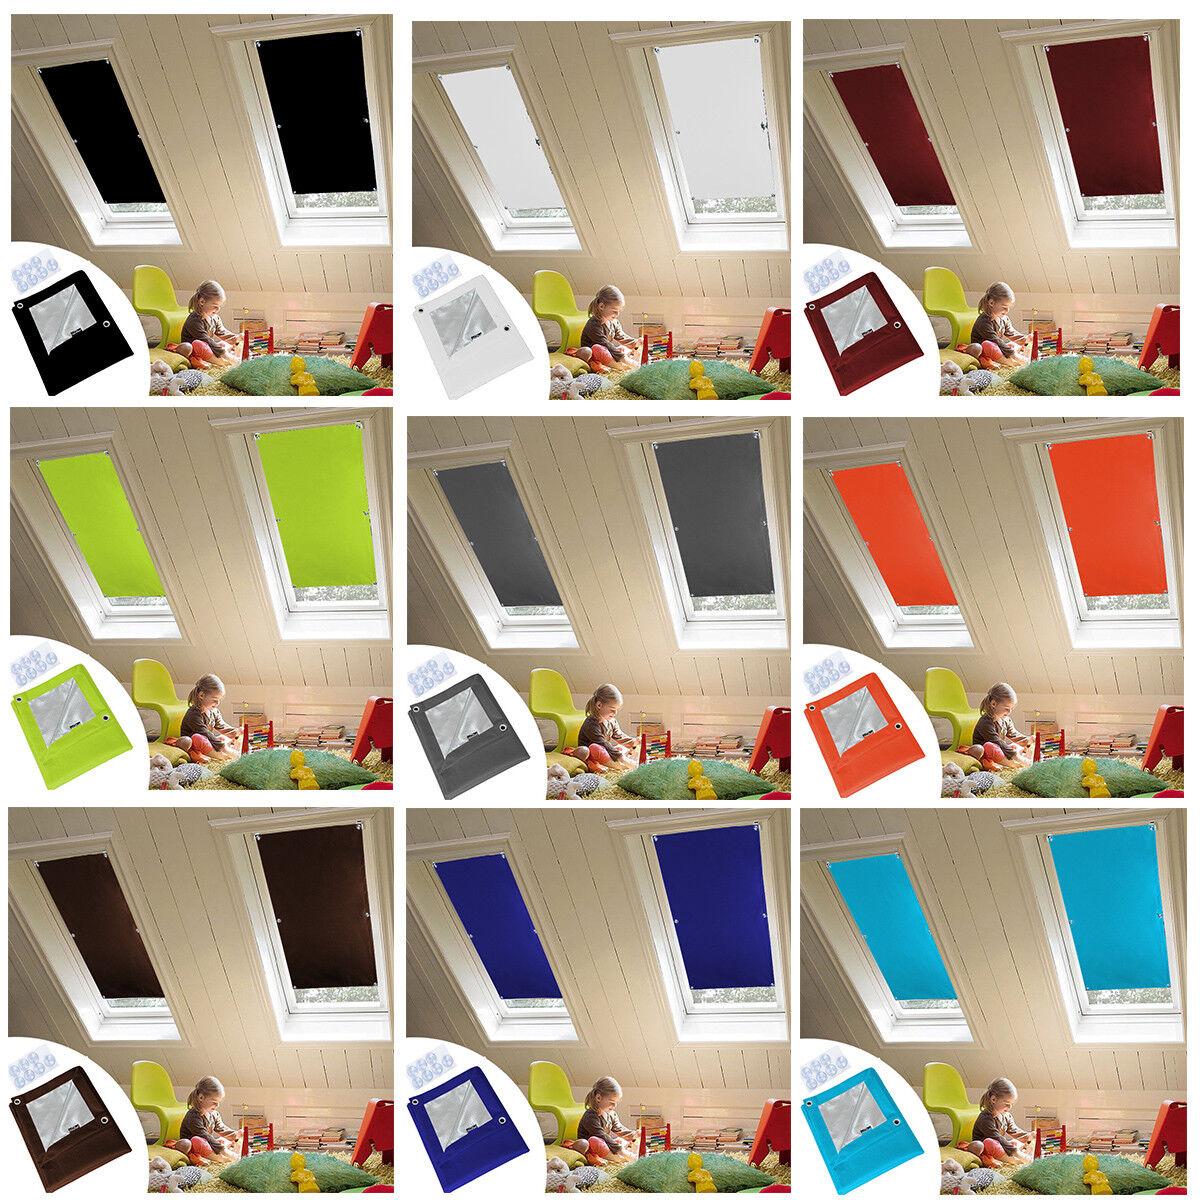 verdunkelung rollo sonnenrollo fensterrollo dachfenster. Black Bedroom Furniture Sets. Home Design Ideas